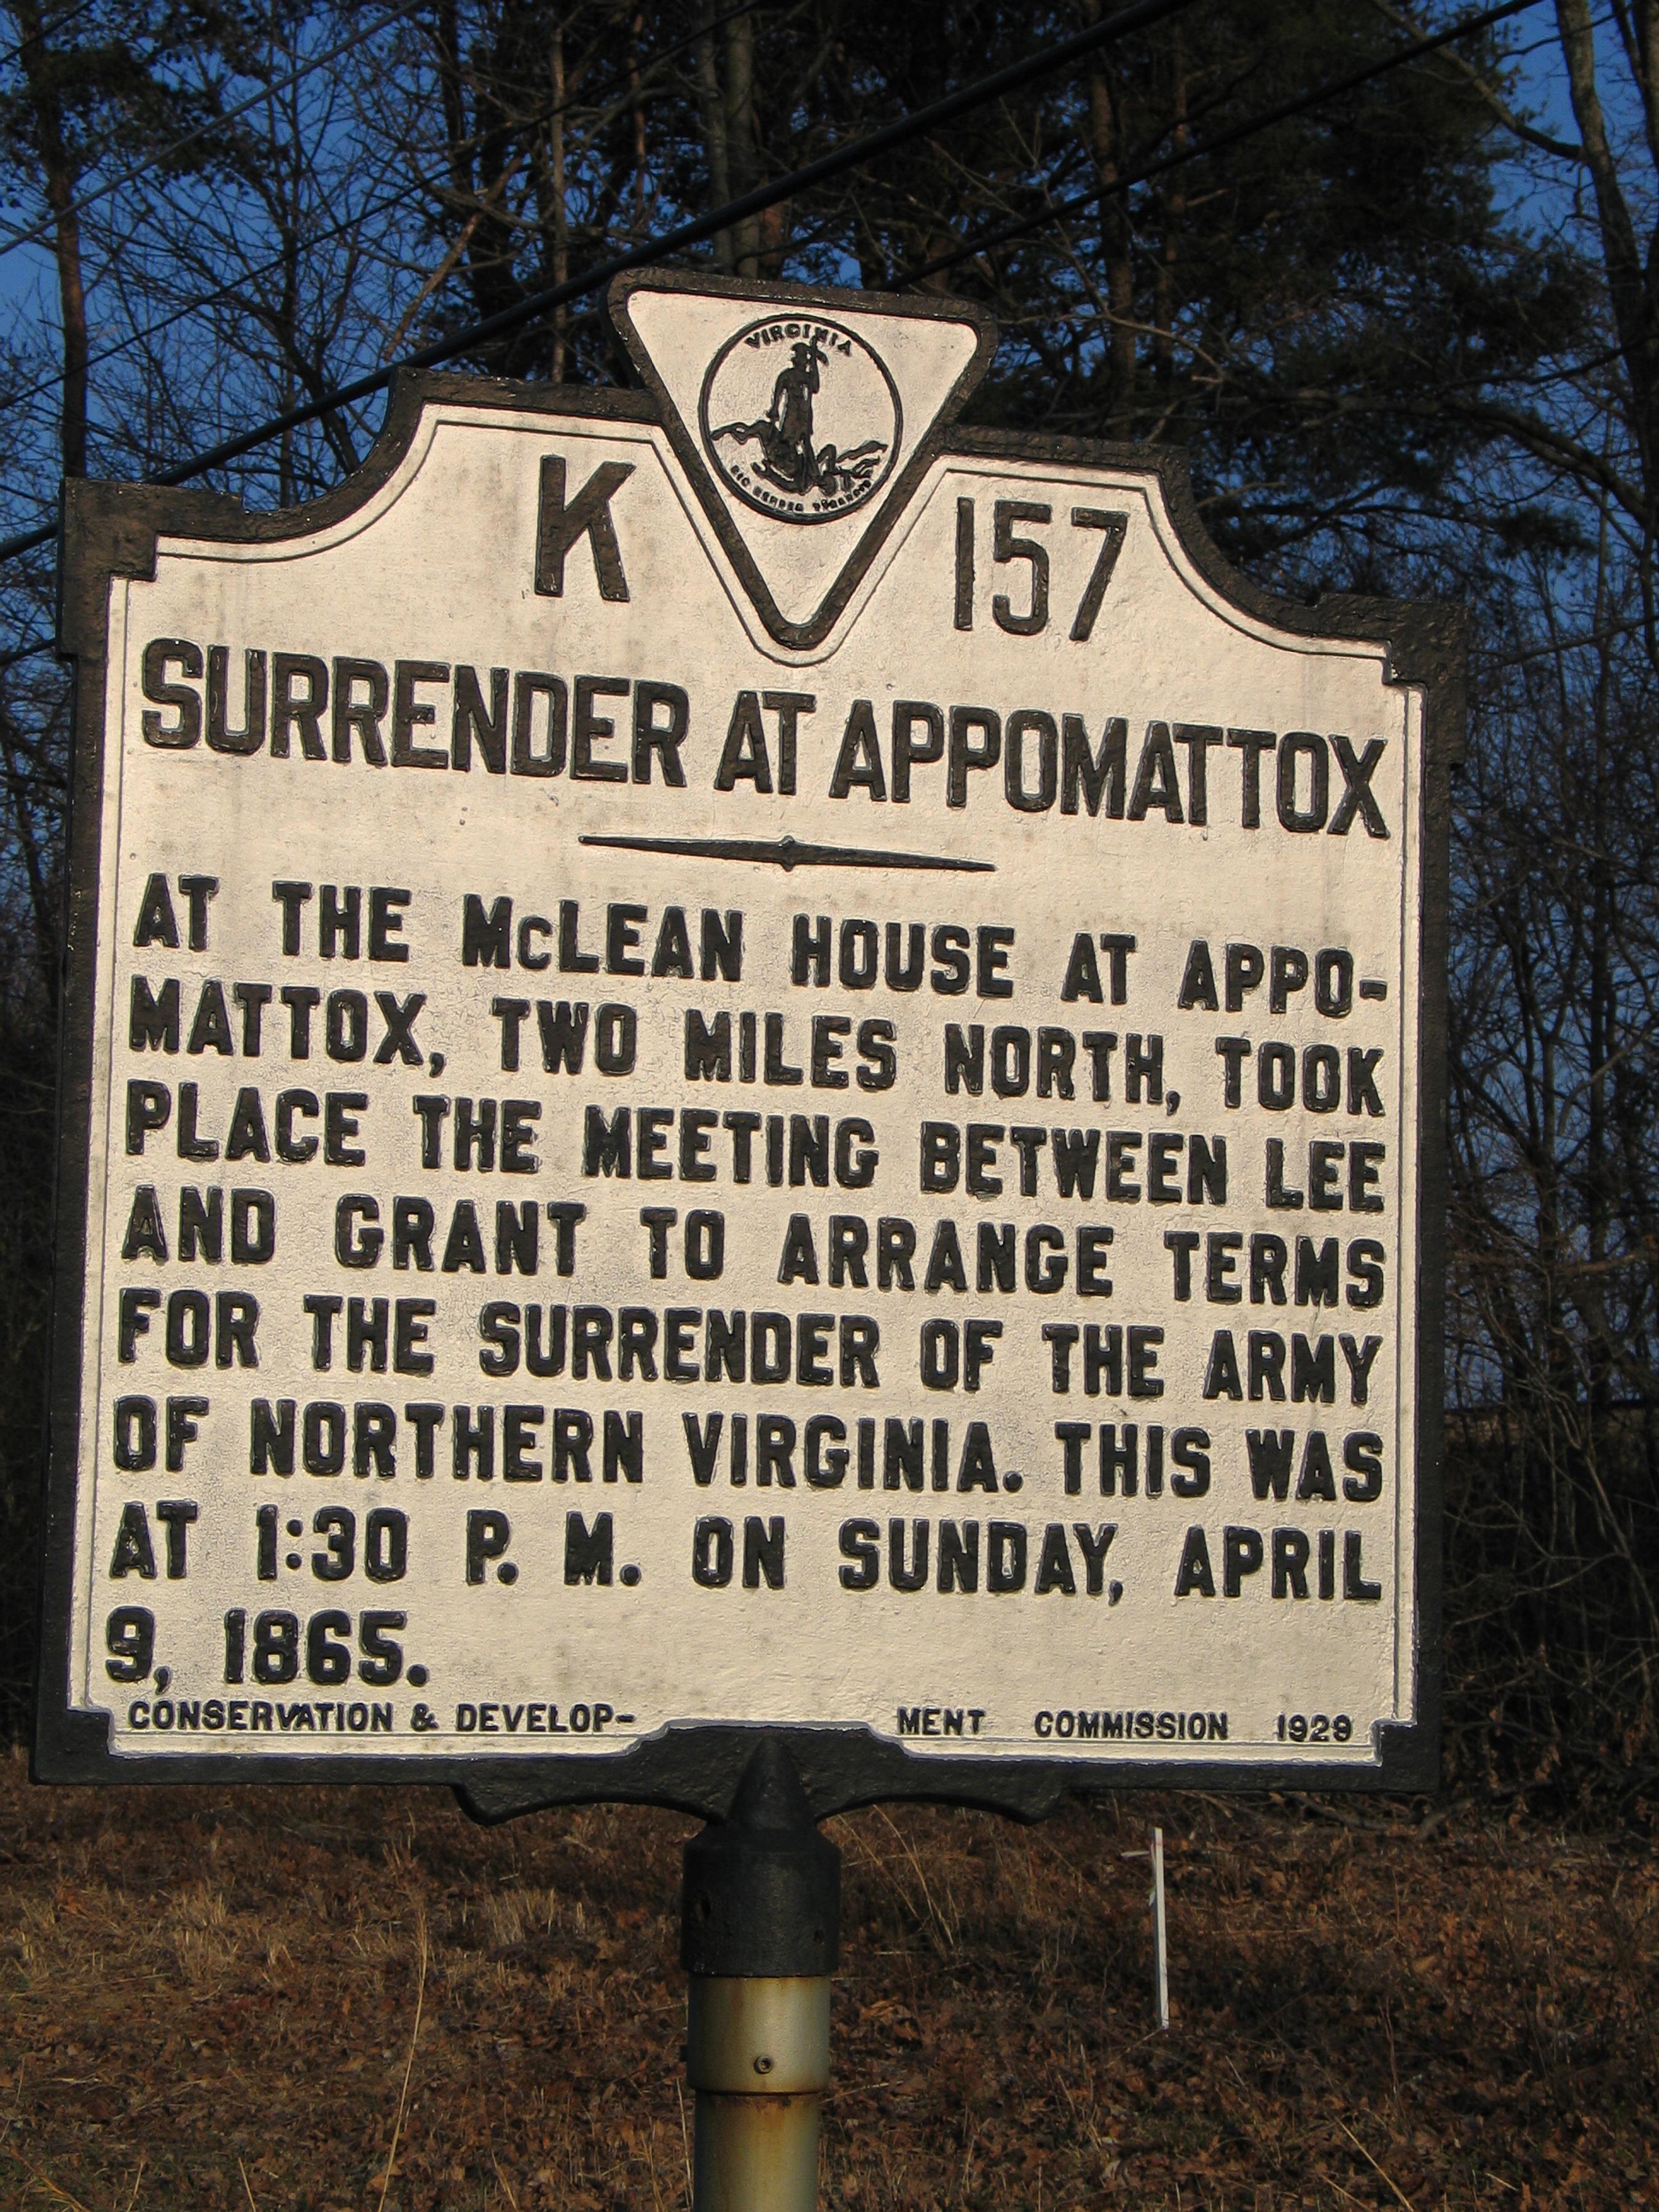 VA-K157 Surrender At Appomattox